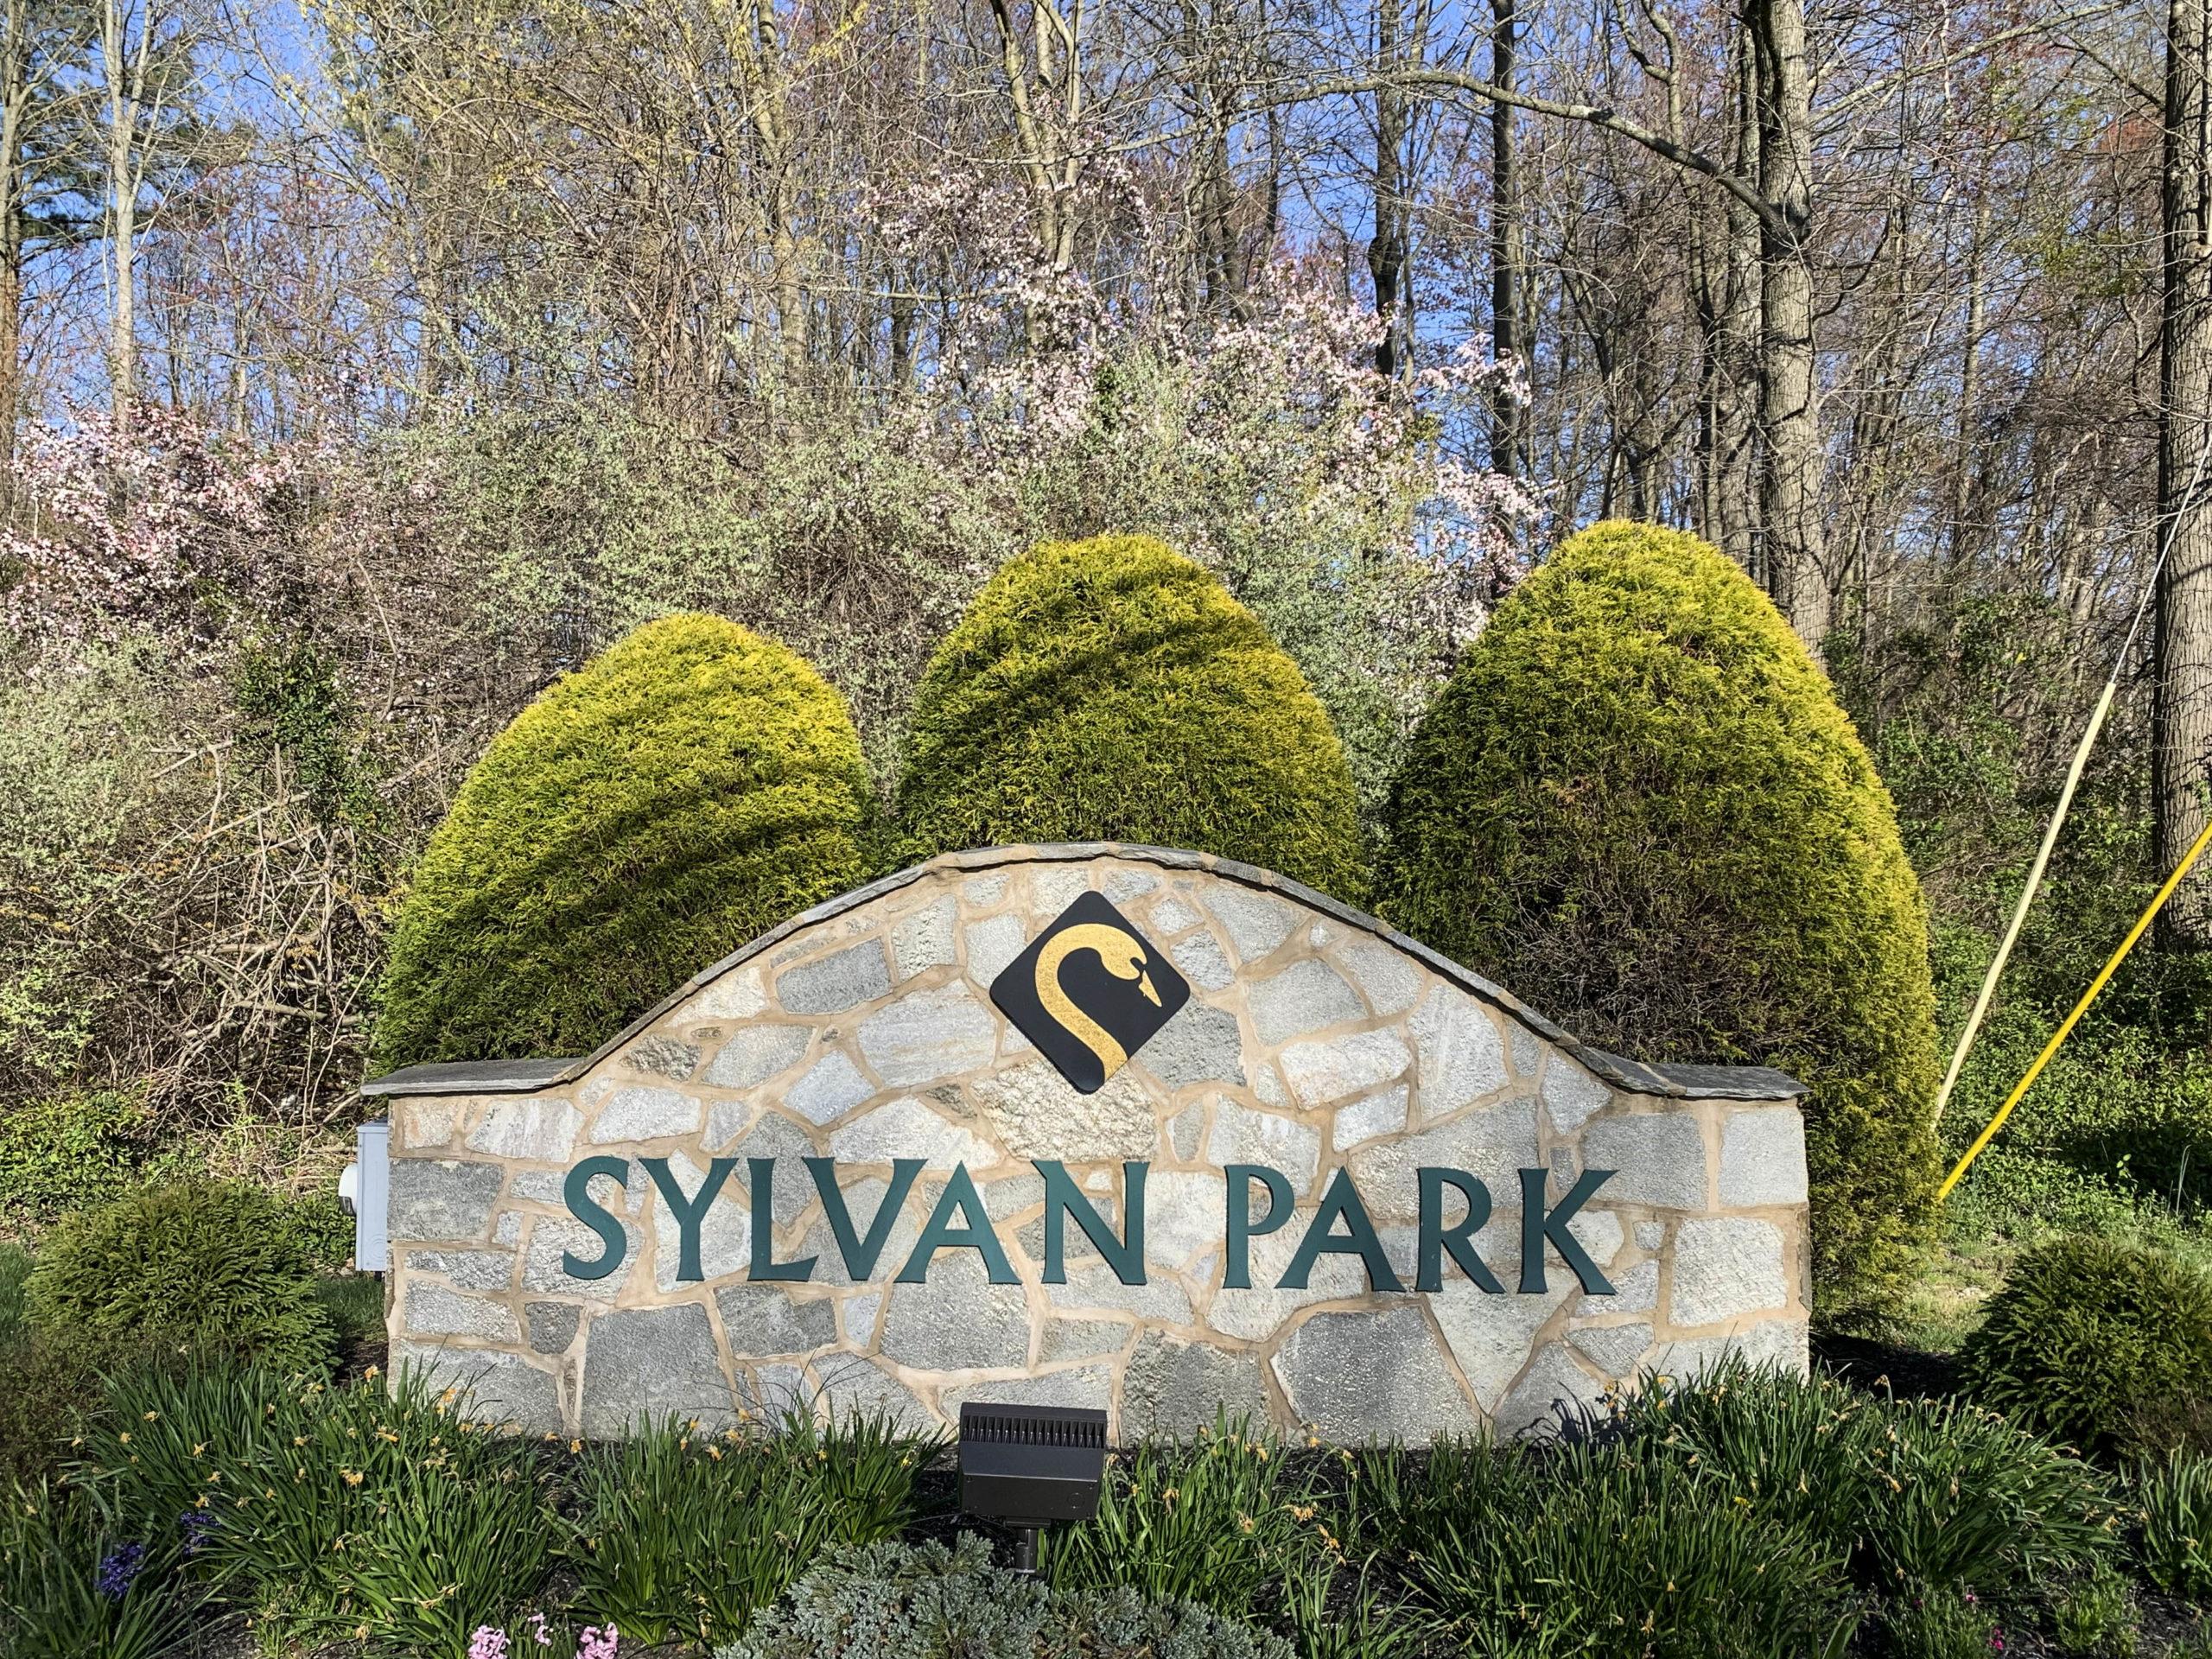 Sylvan Park Entry Sign